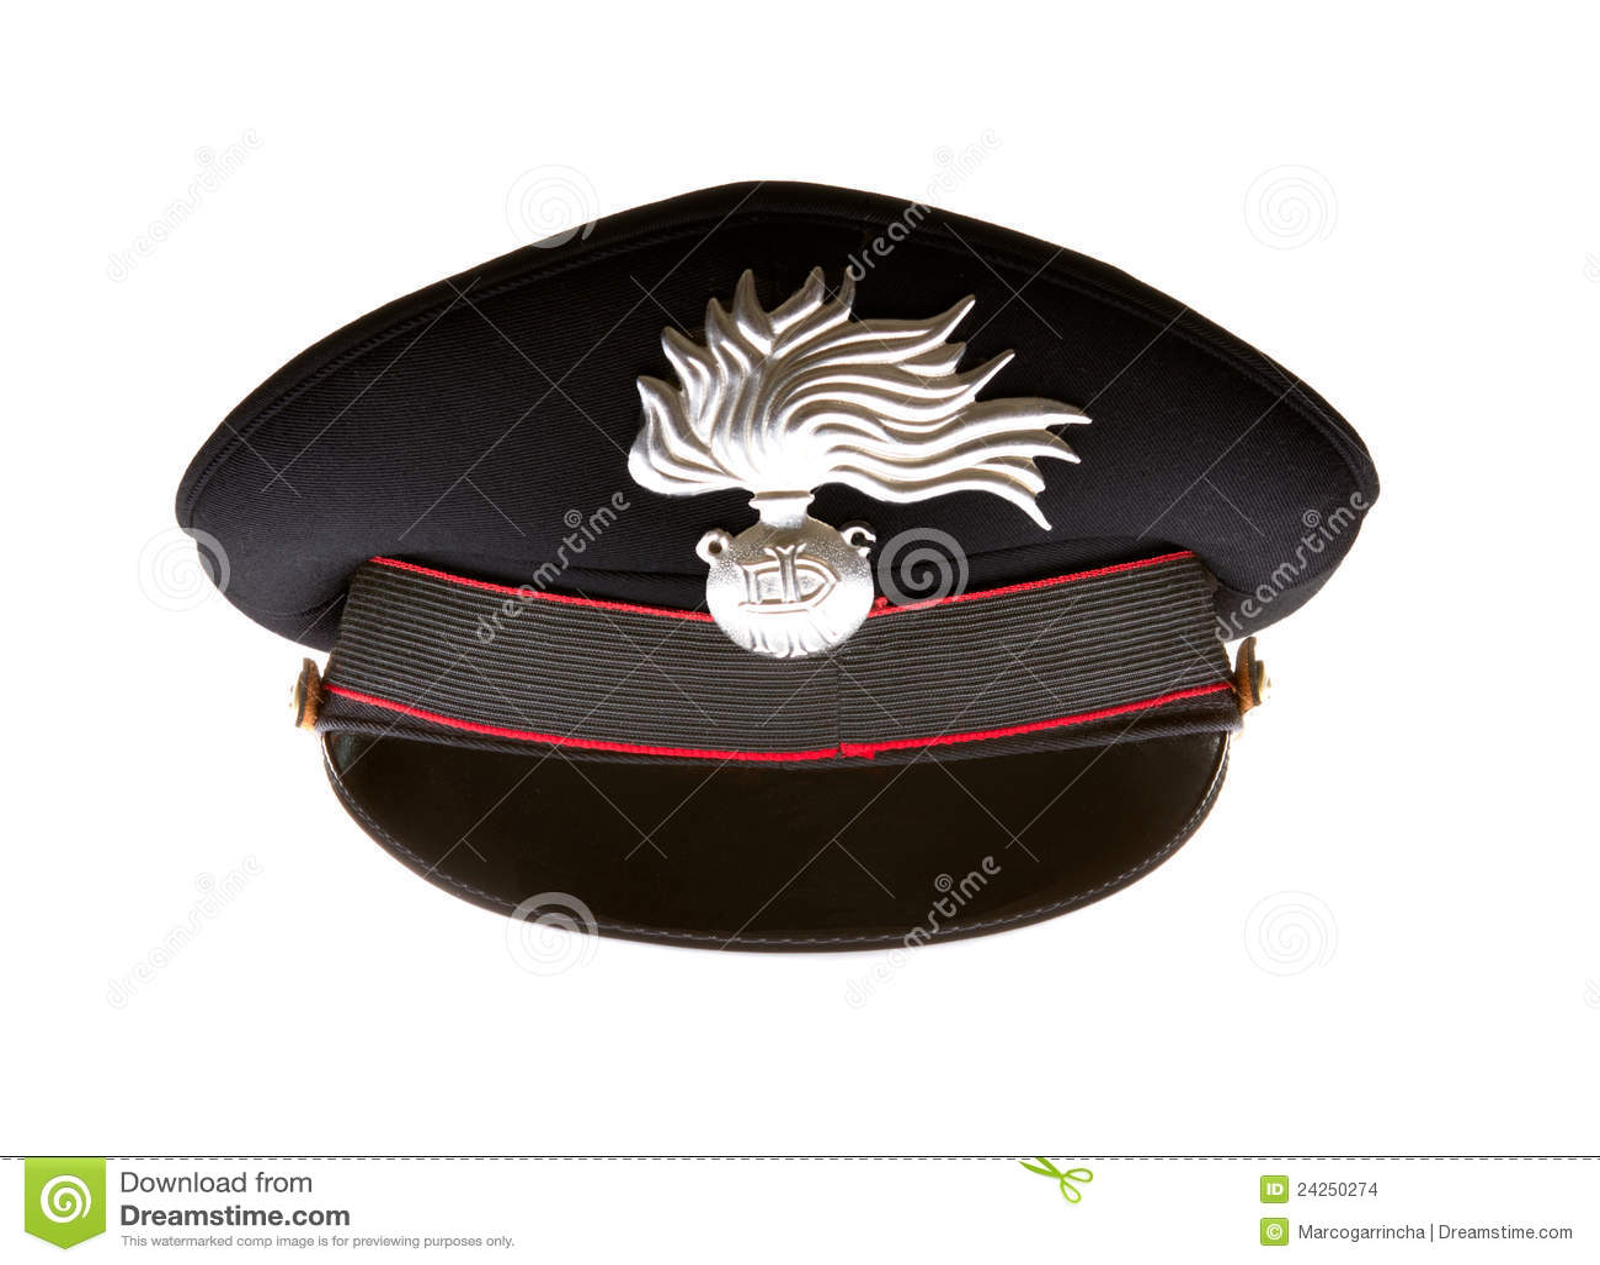 Carabiniere Hat Of Italian Carabinieri Stock Images - Image: 24250274